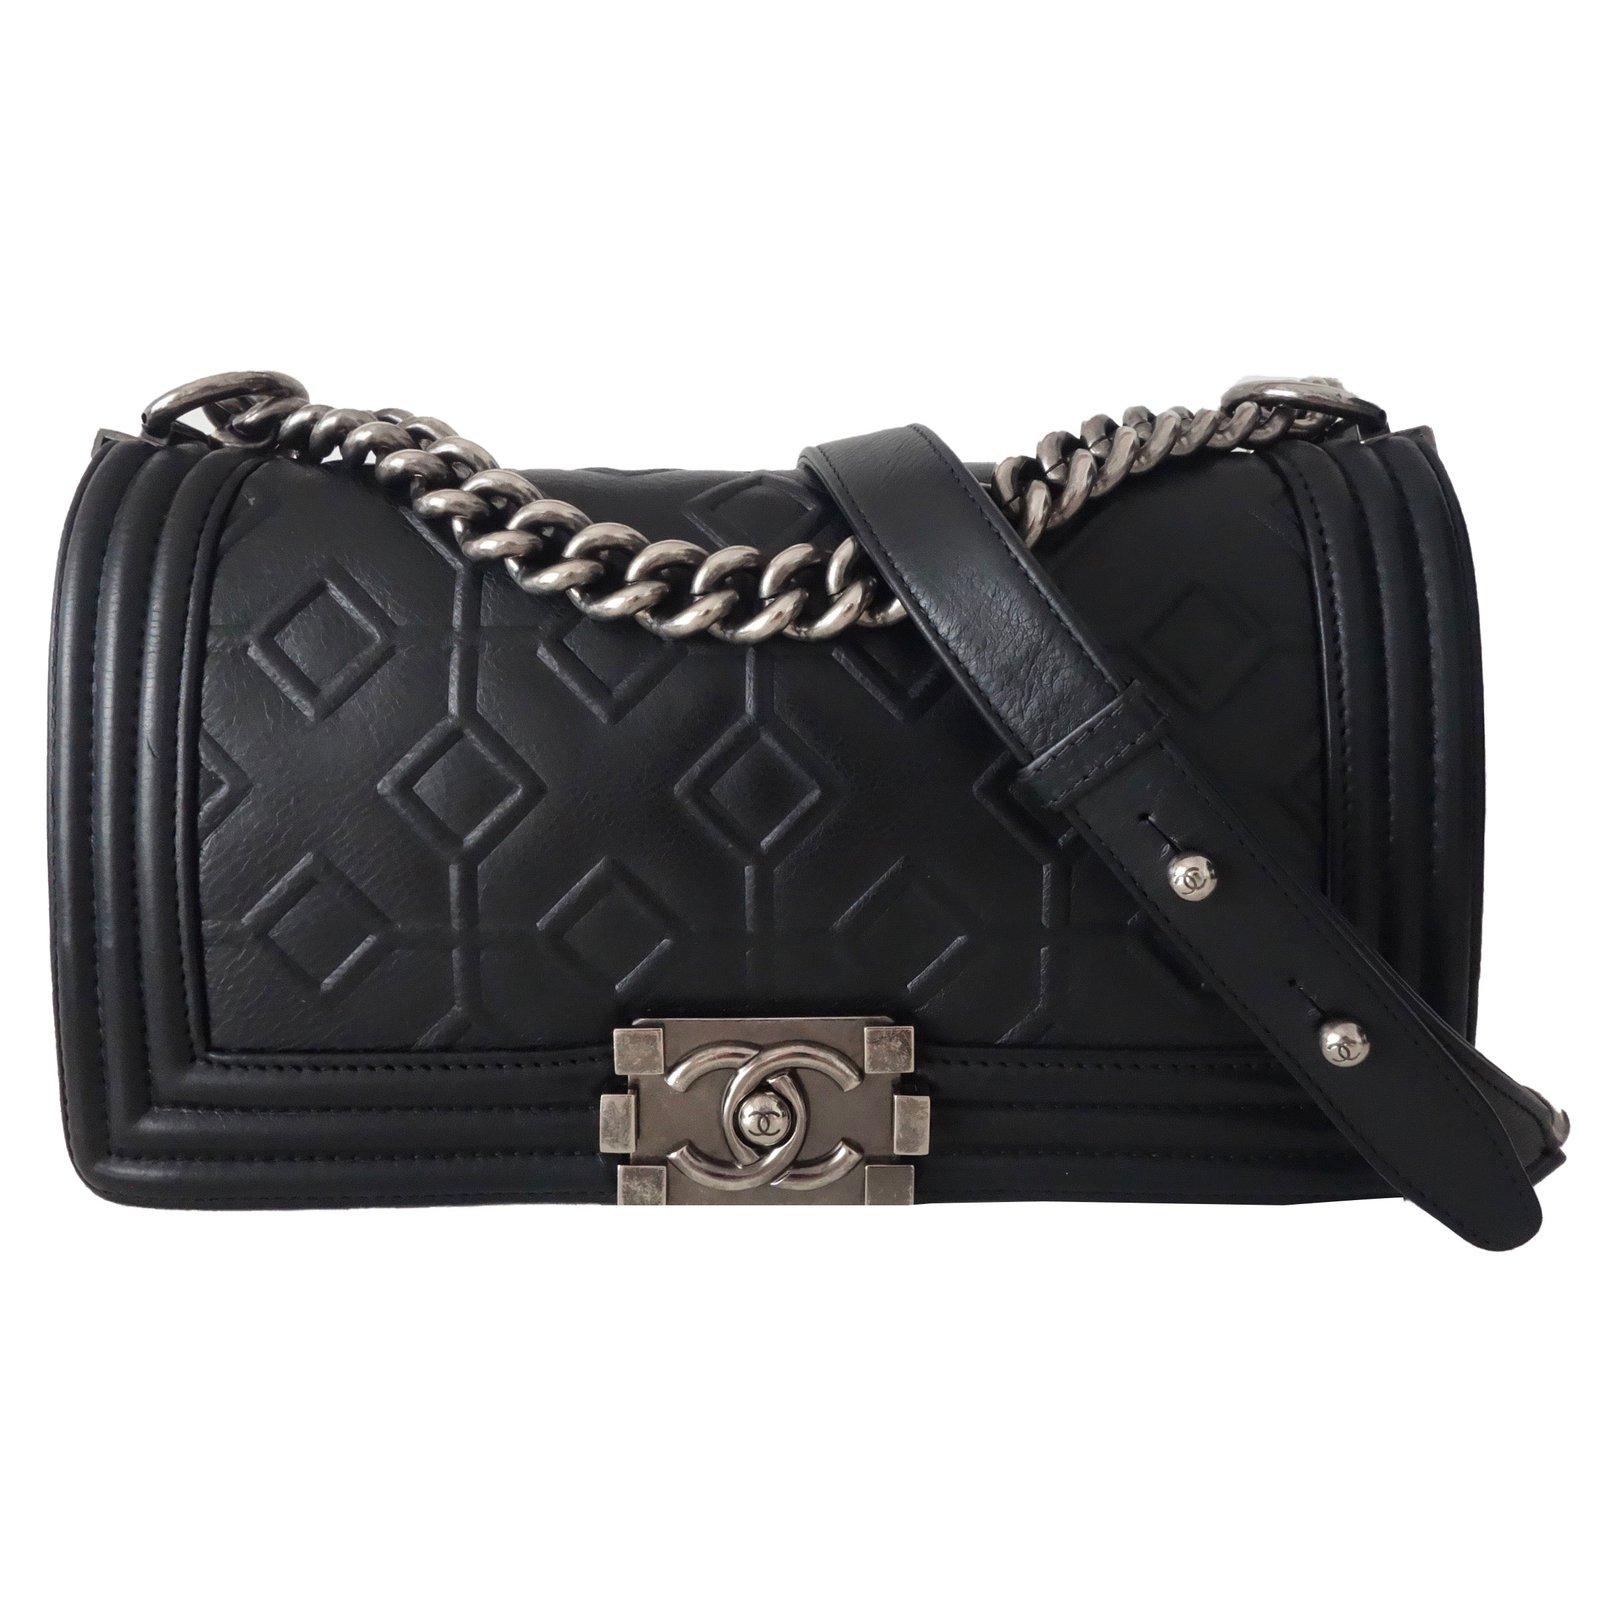 sacs main chanel sac chanel boy cuir noir cuir noir joli closet. Black Bedroom Furniture Sets. Home Design Ideas